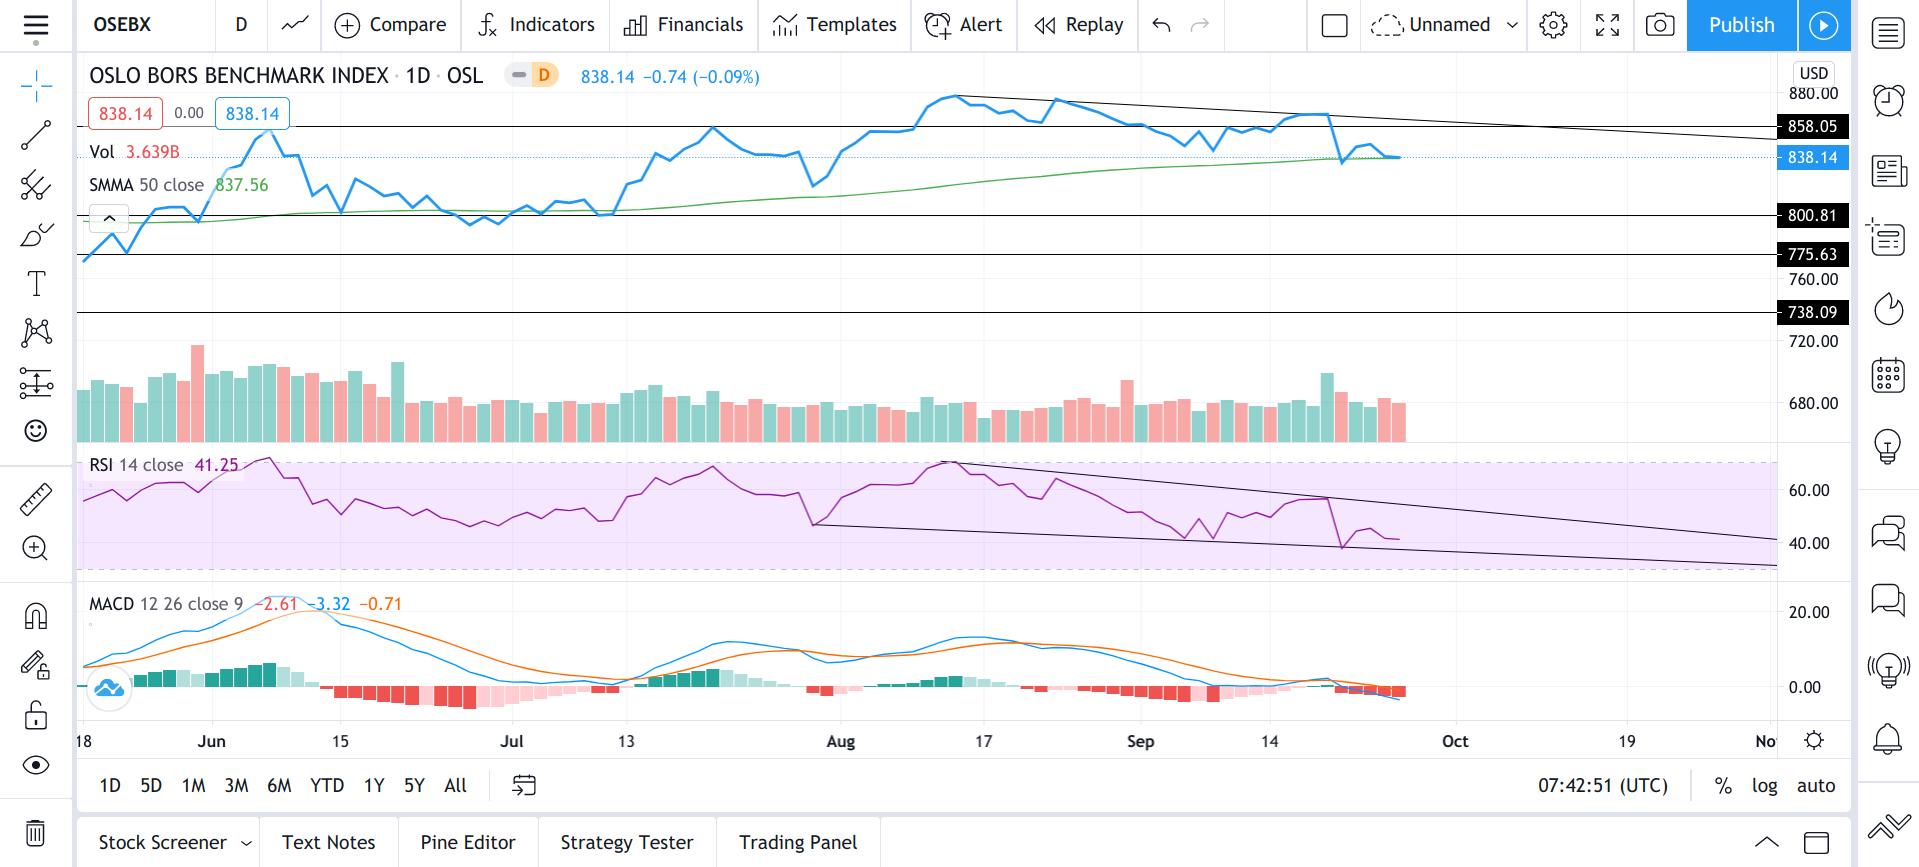 oslo børs indeks aksjer analyse teknisk forum